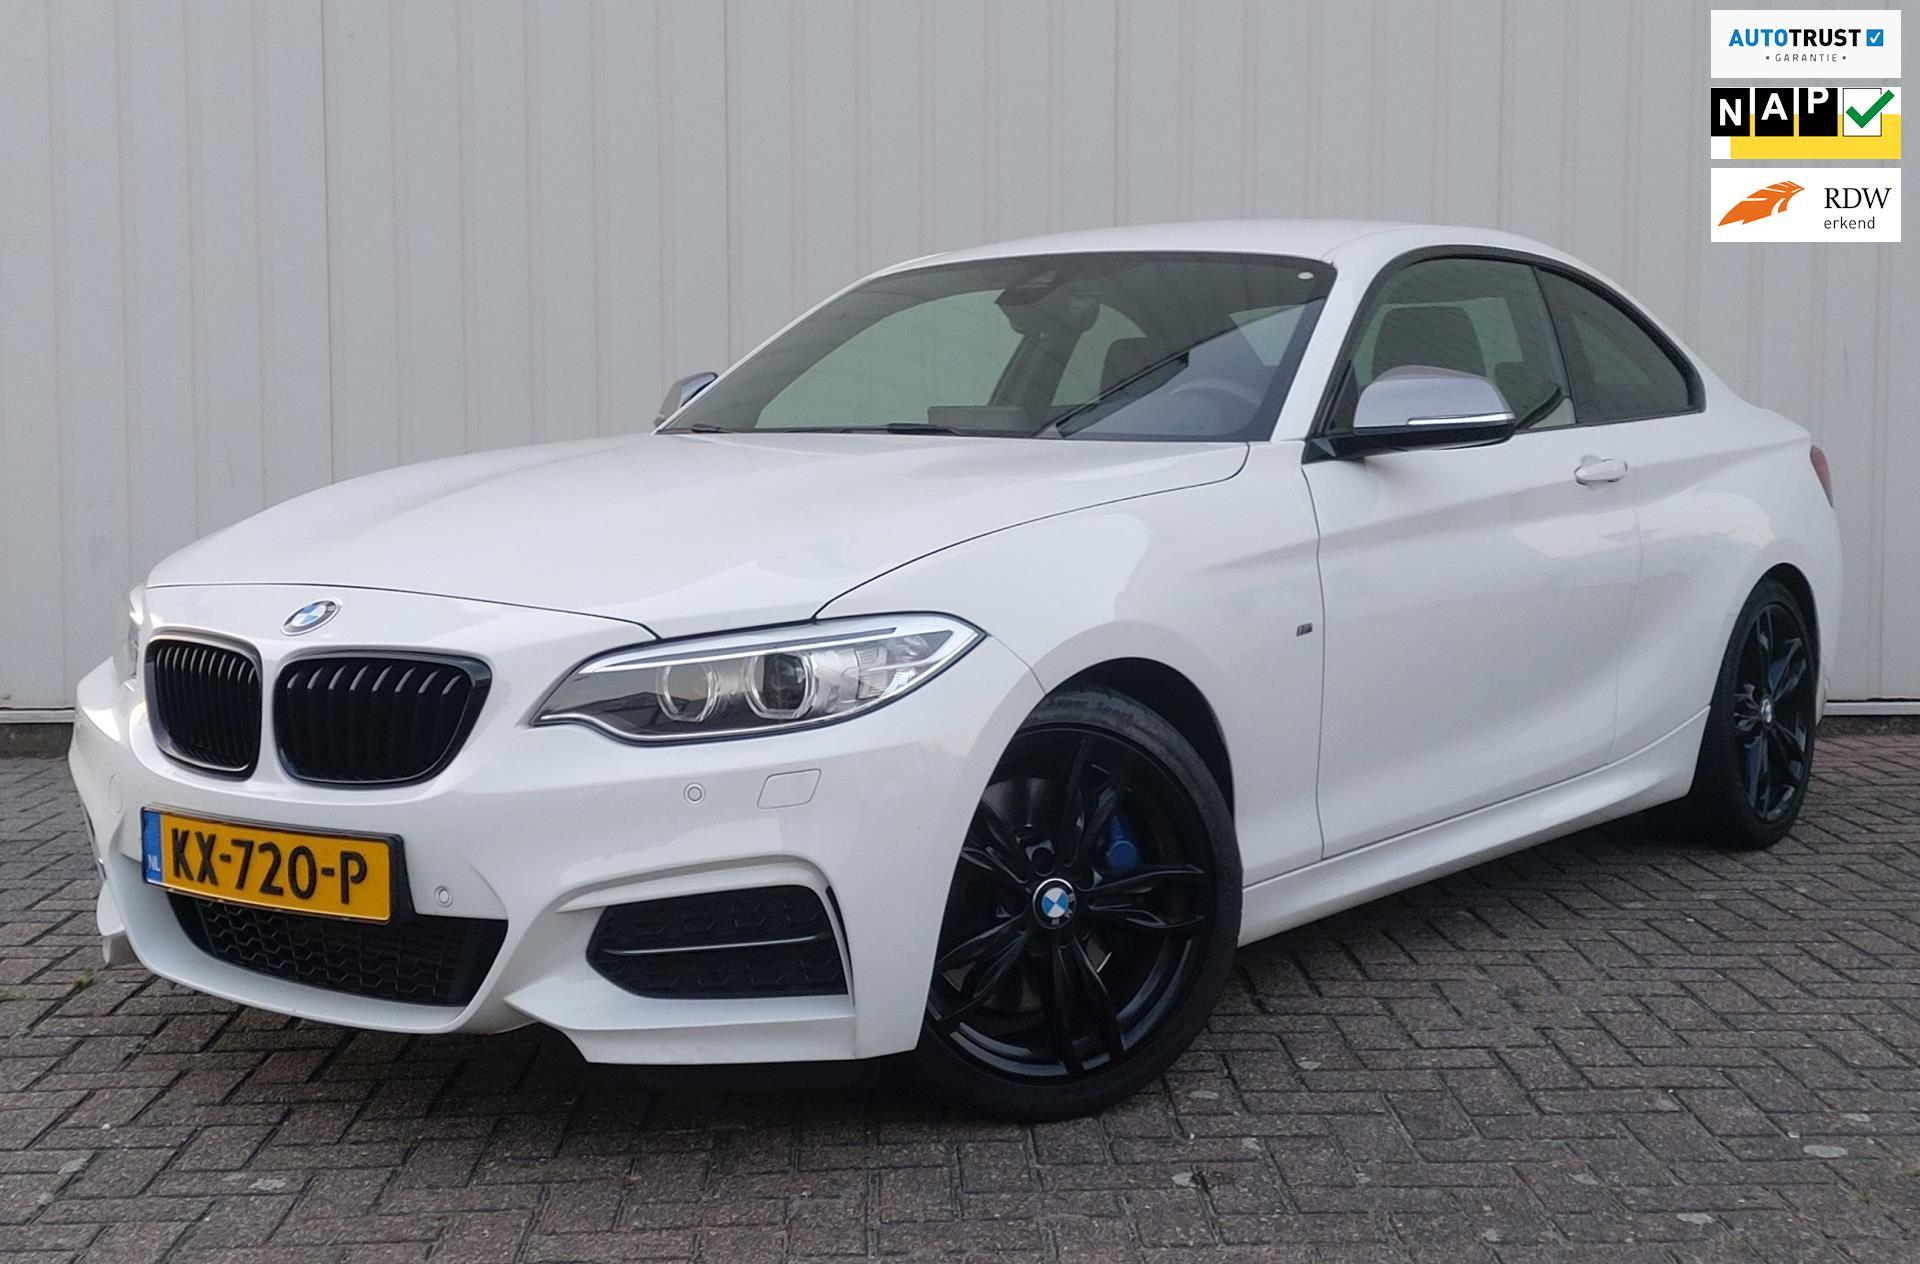 BMW 2-serie Coupé occasion - Heel Holland Rijdt